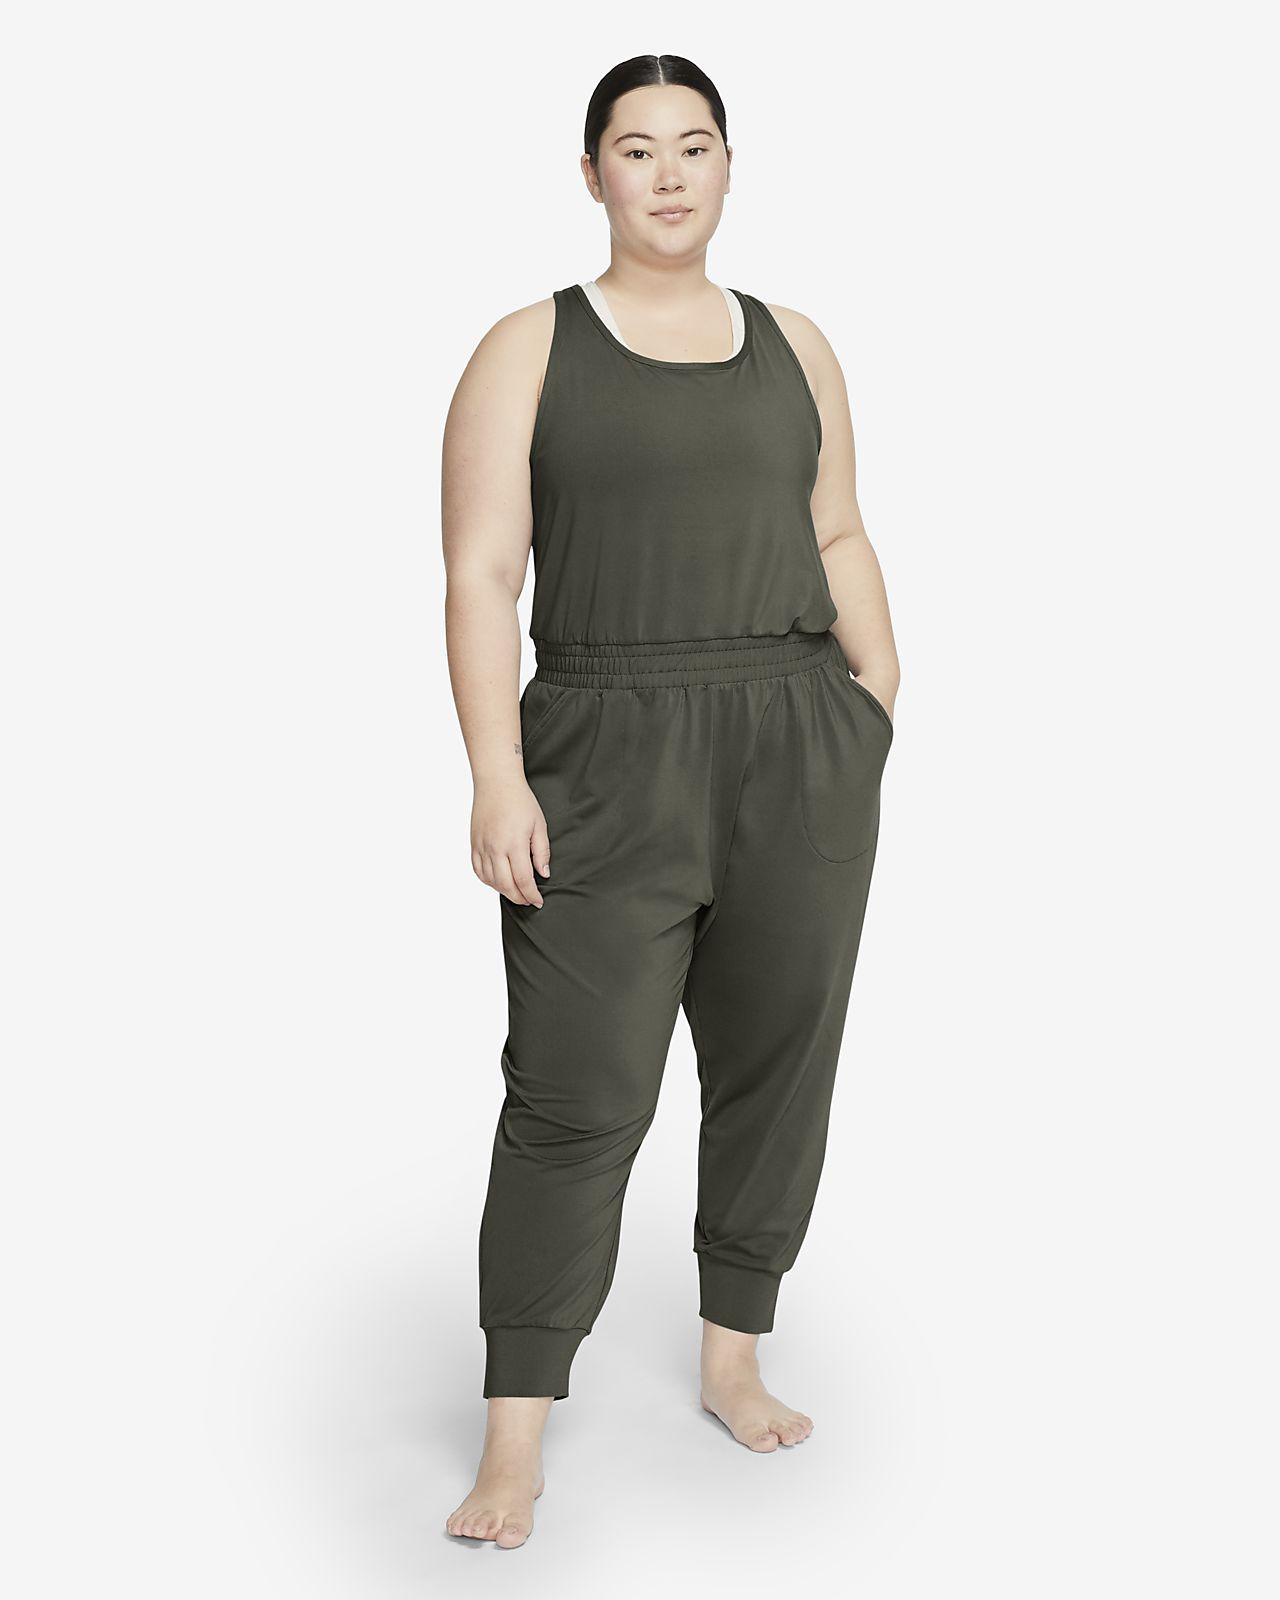 Nike Yoga Women's 7/8 Jumpsuit (Plus Size)